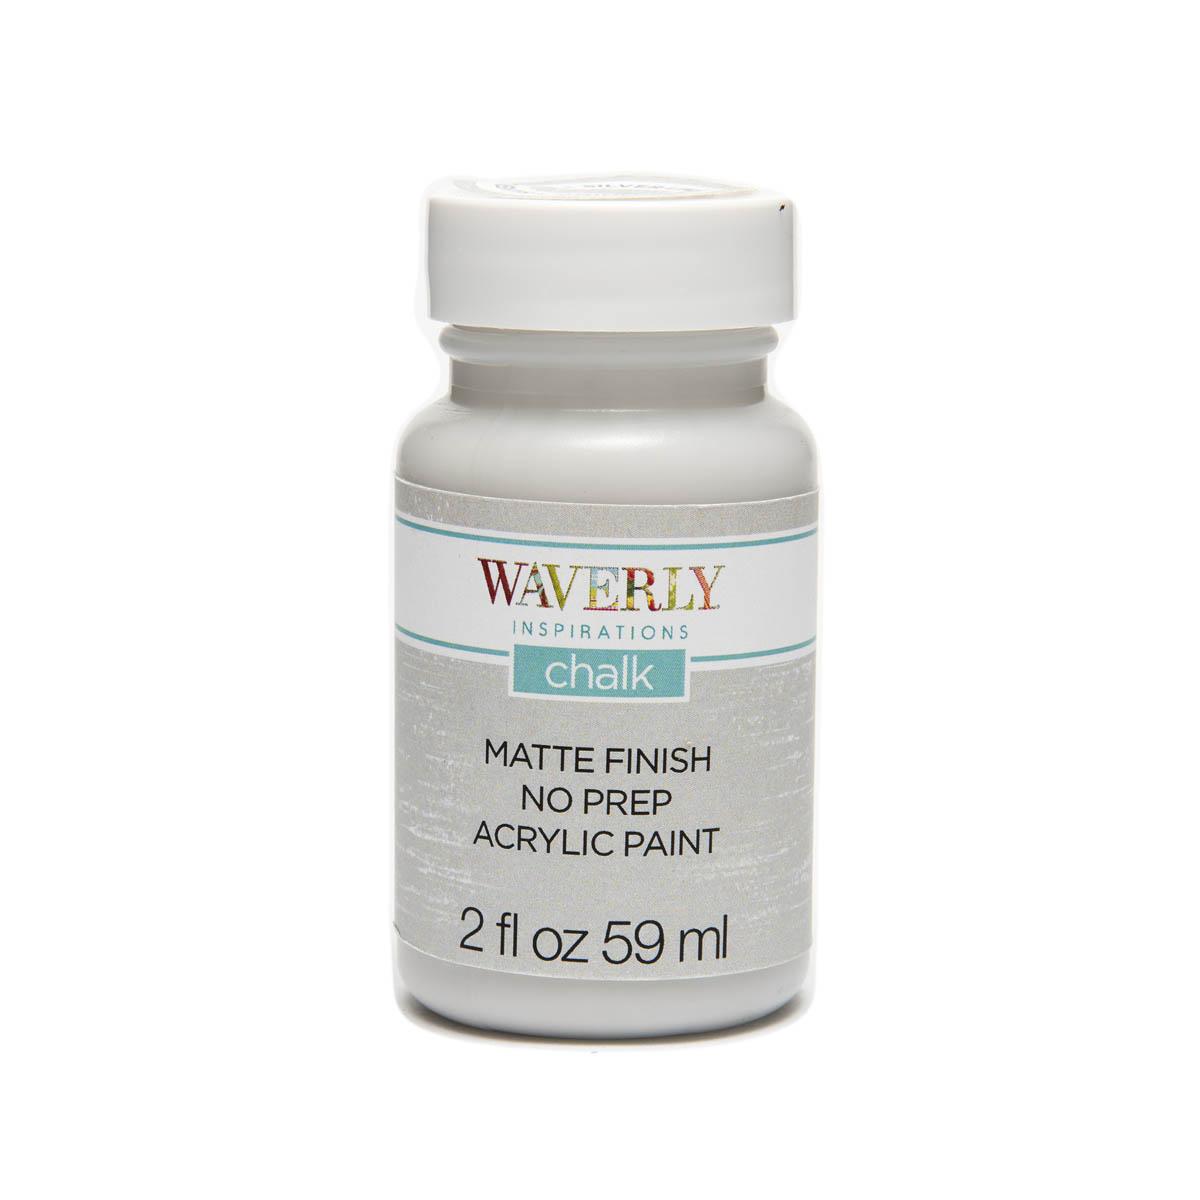 Waverly ® Inspirations Chalk Finish Acrylic Paint - Silver Lining, 2 oz.